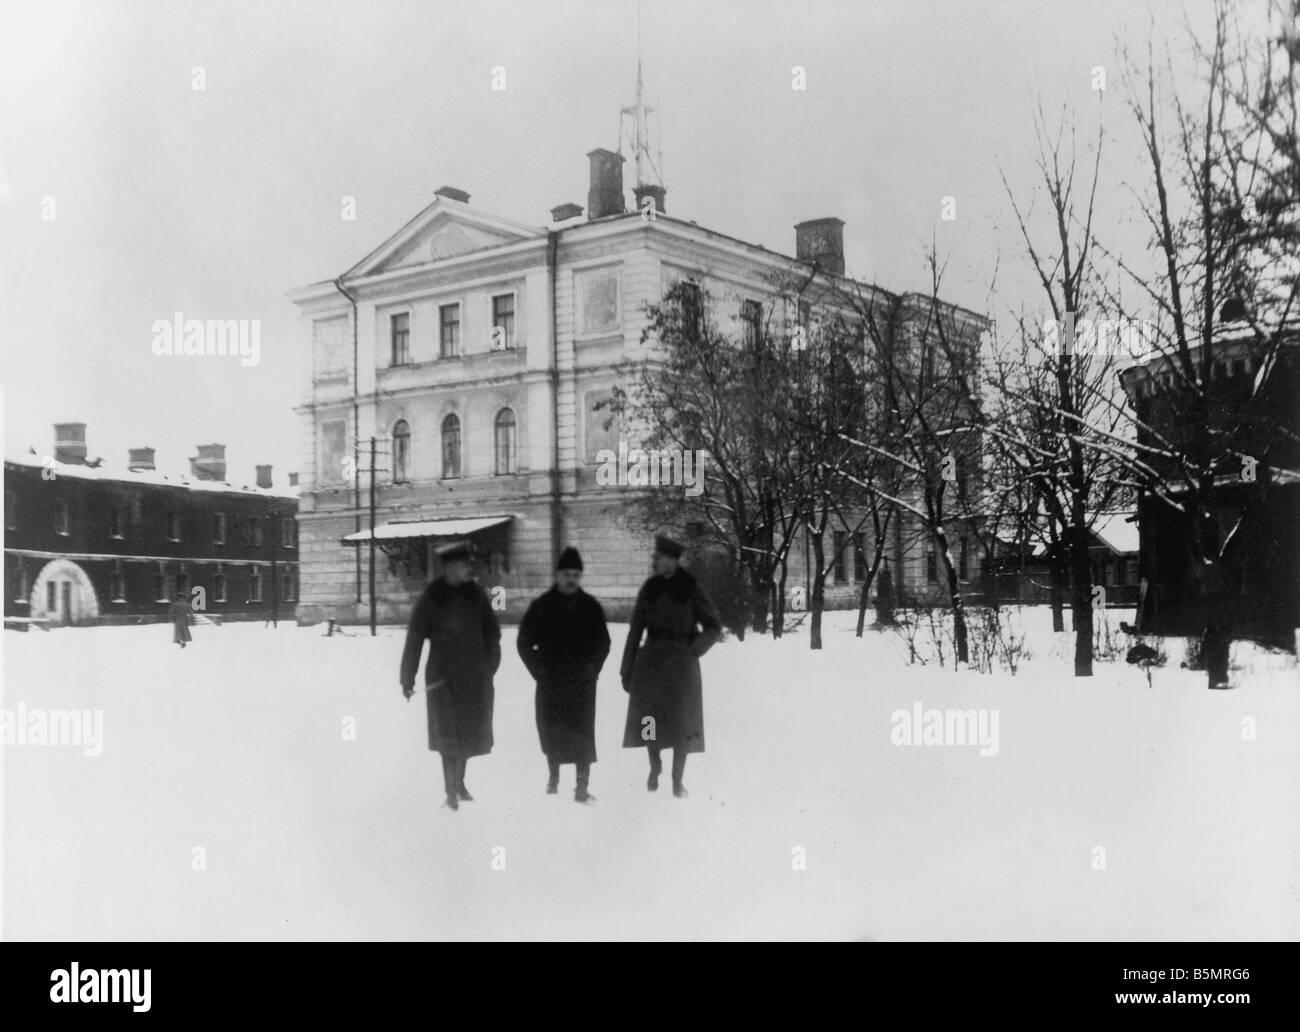 9 1917 12 15 A1 2 edificios de conferencias 1917 Guerra Mundial 1 1914 18 ruso de Brest Litowsk armisticio alemán Imagen De Stock